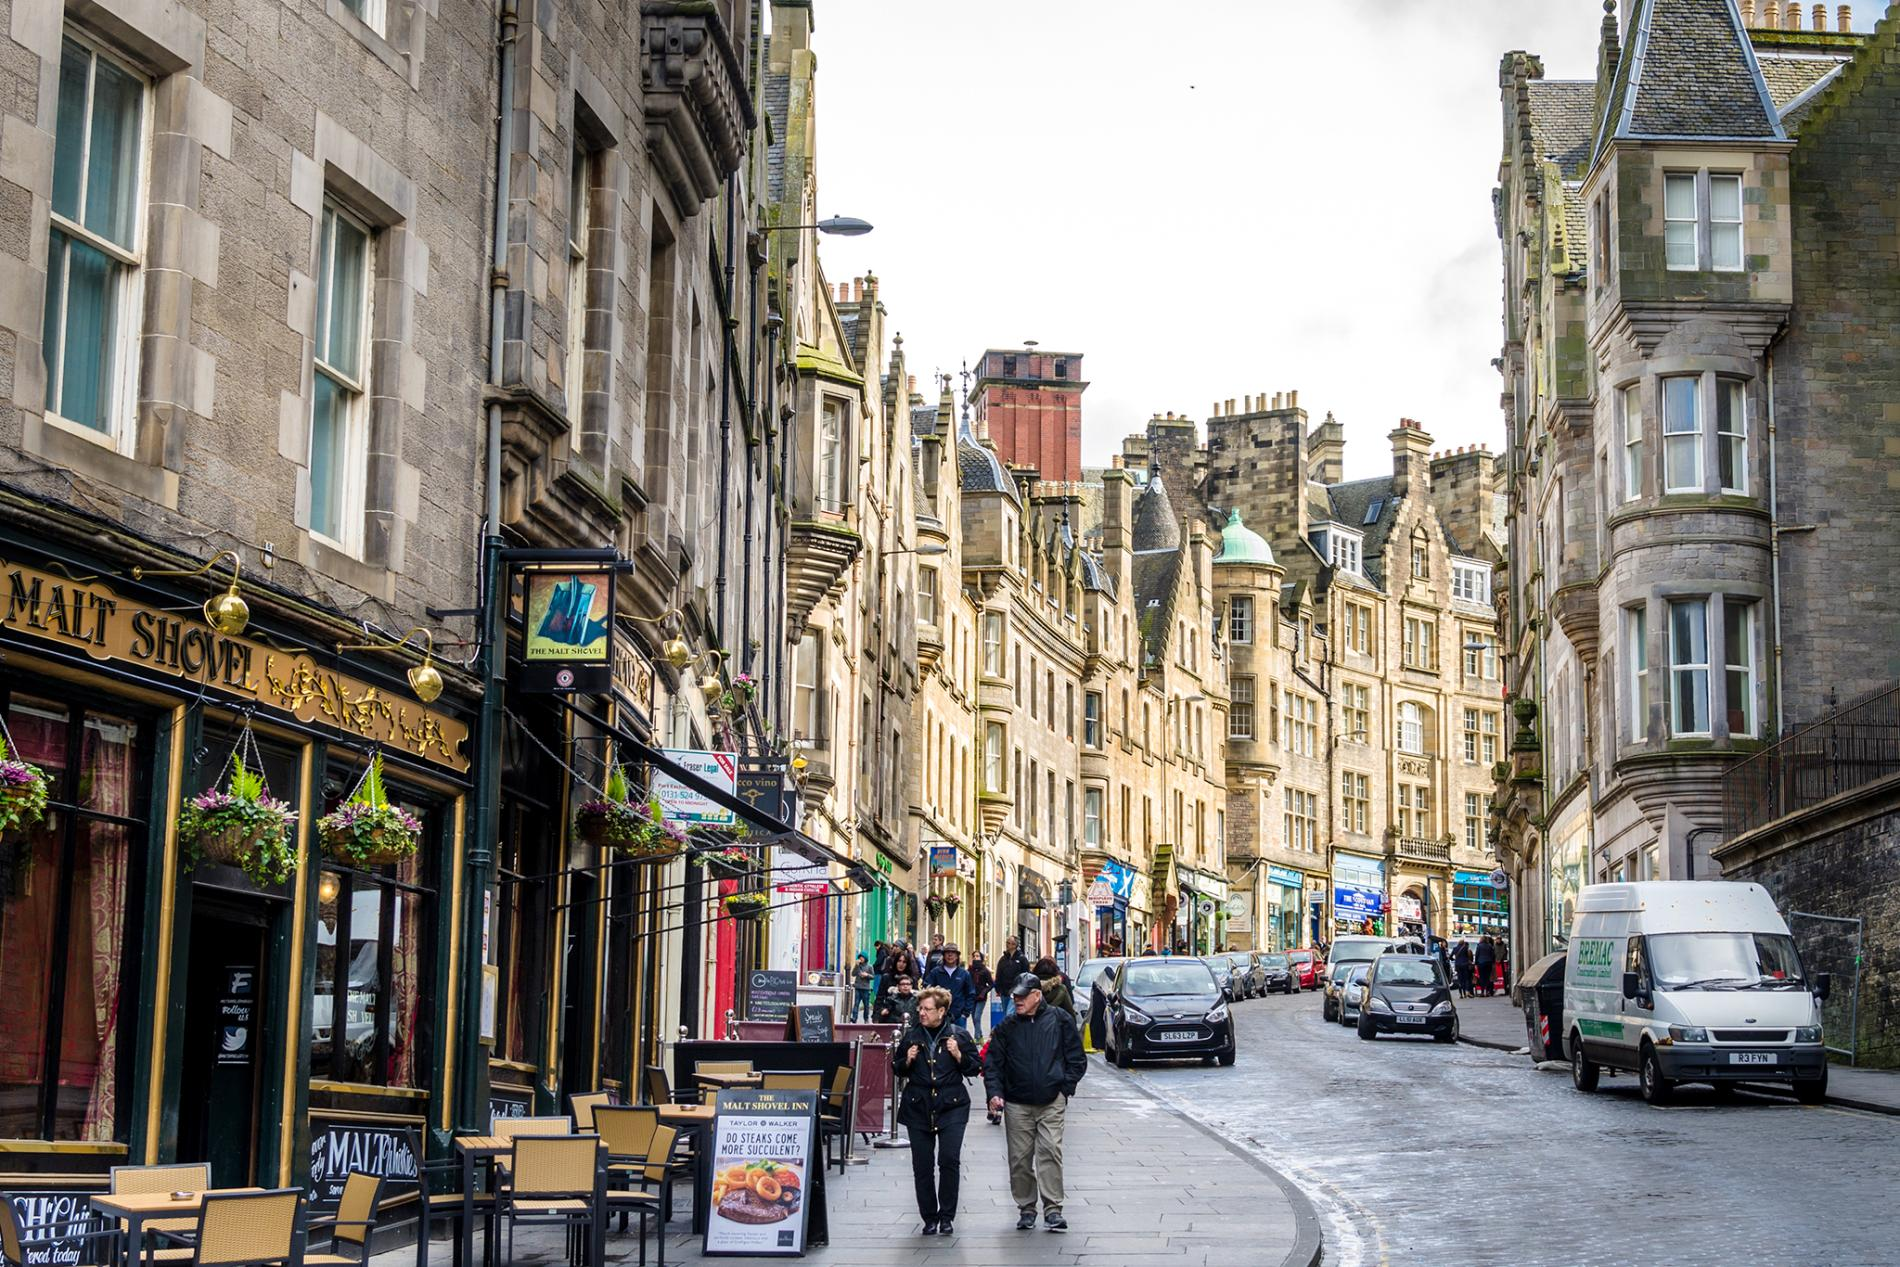 Edinburg, Scotland